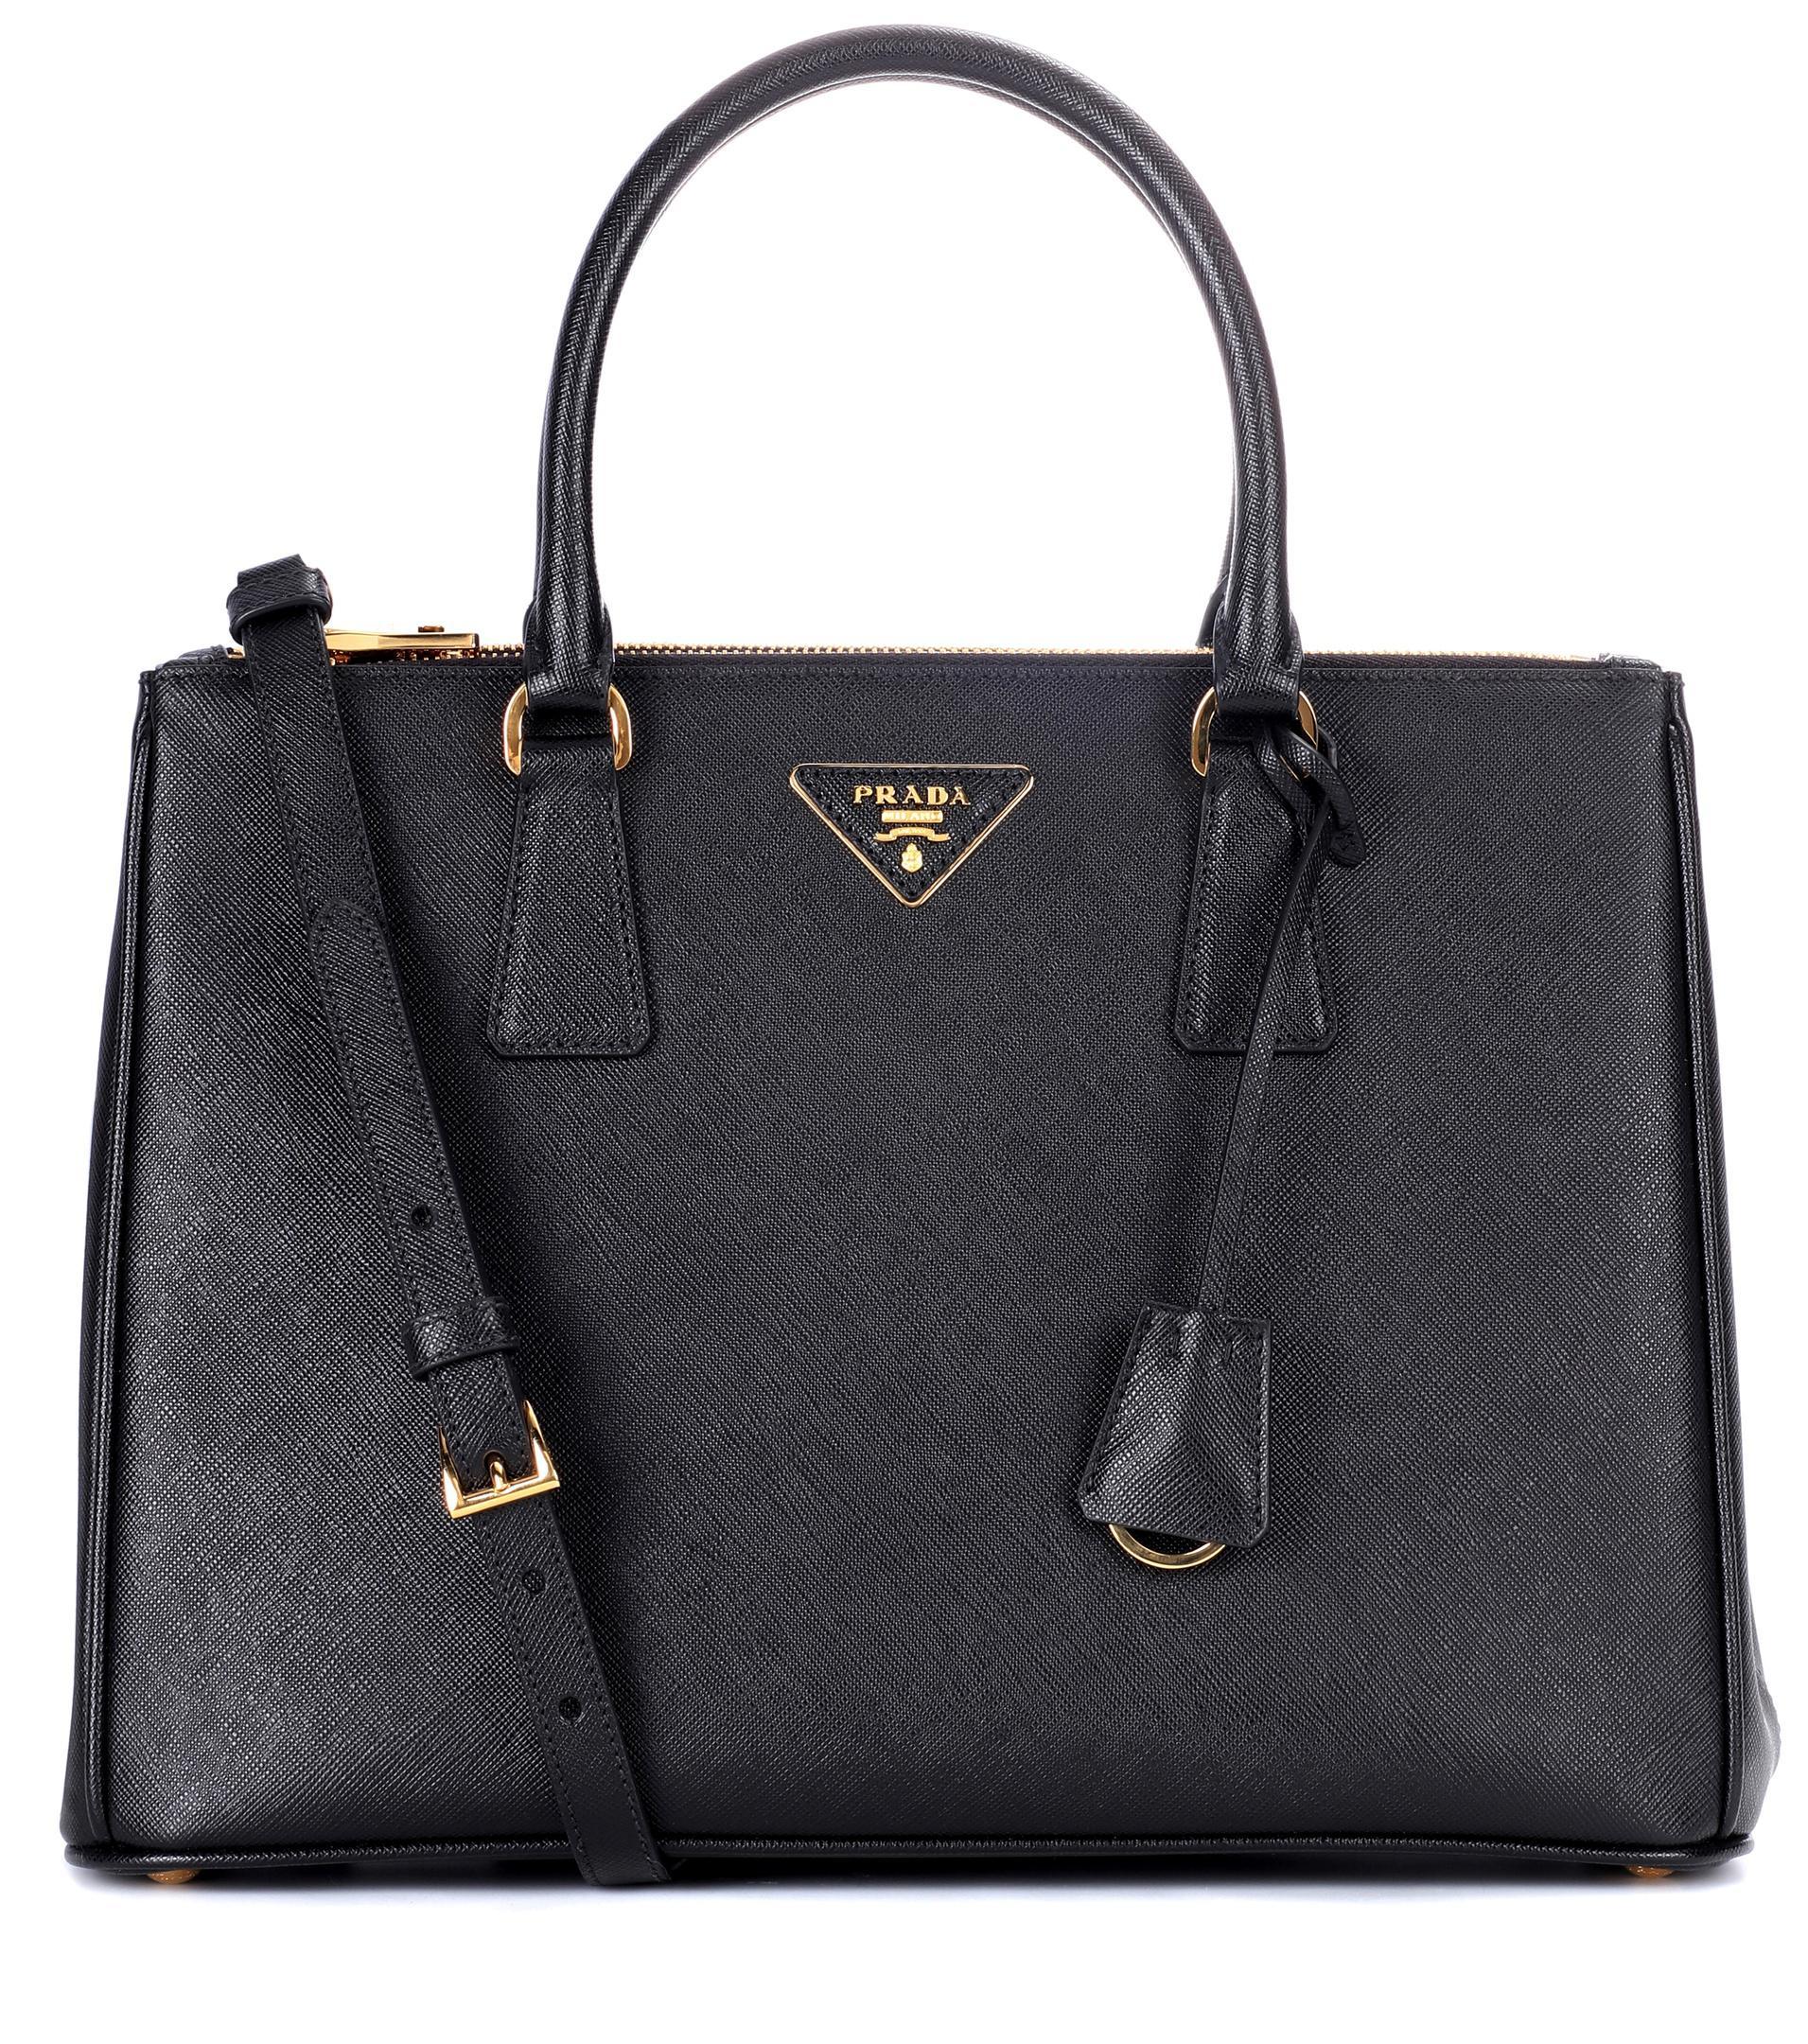 12e7110626d6 cheapest prada galleria saffiano leather tote bluette 81146 08725  denmark  prada black galleria saffiano leather tote lyst. view fullscreen 612d0 b54b4